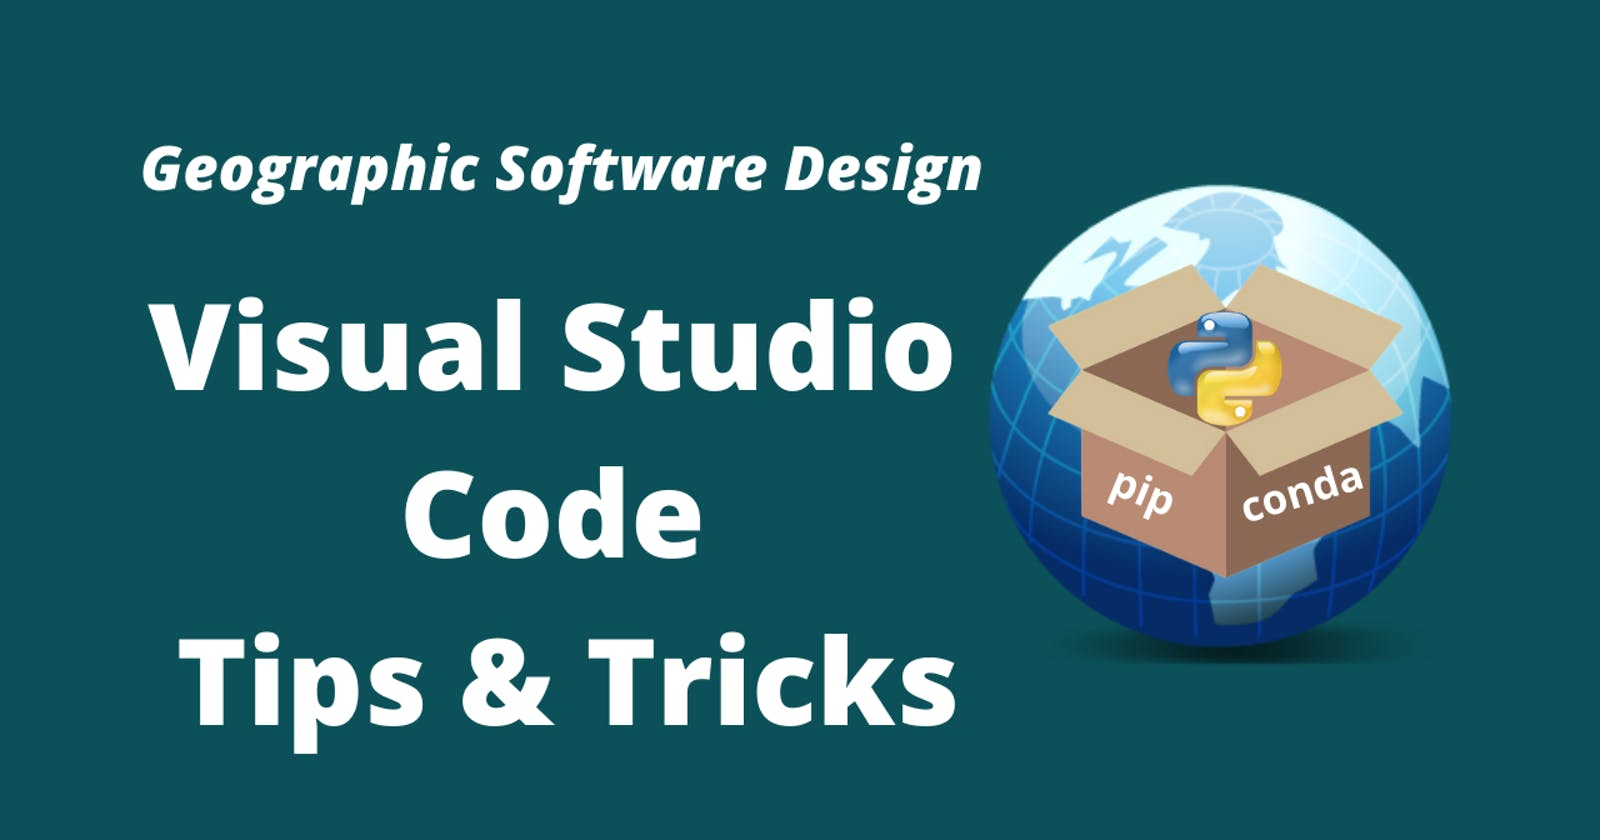 Visual Studio Code Tips & Tricks